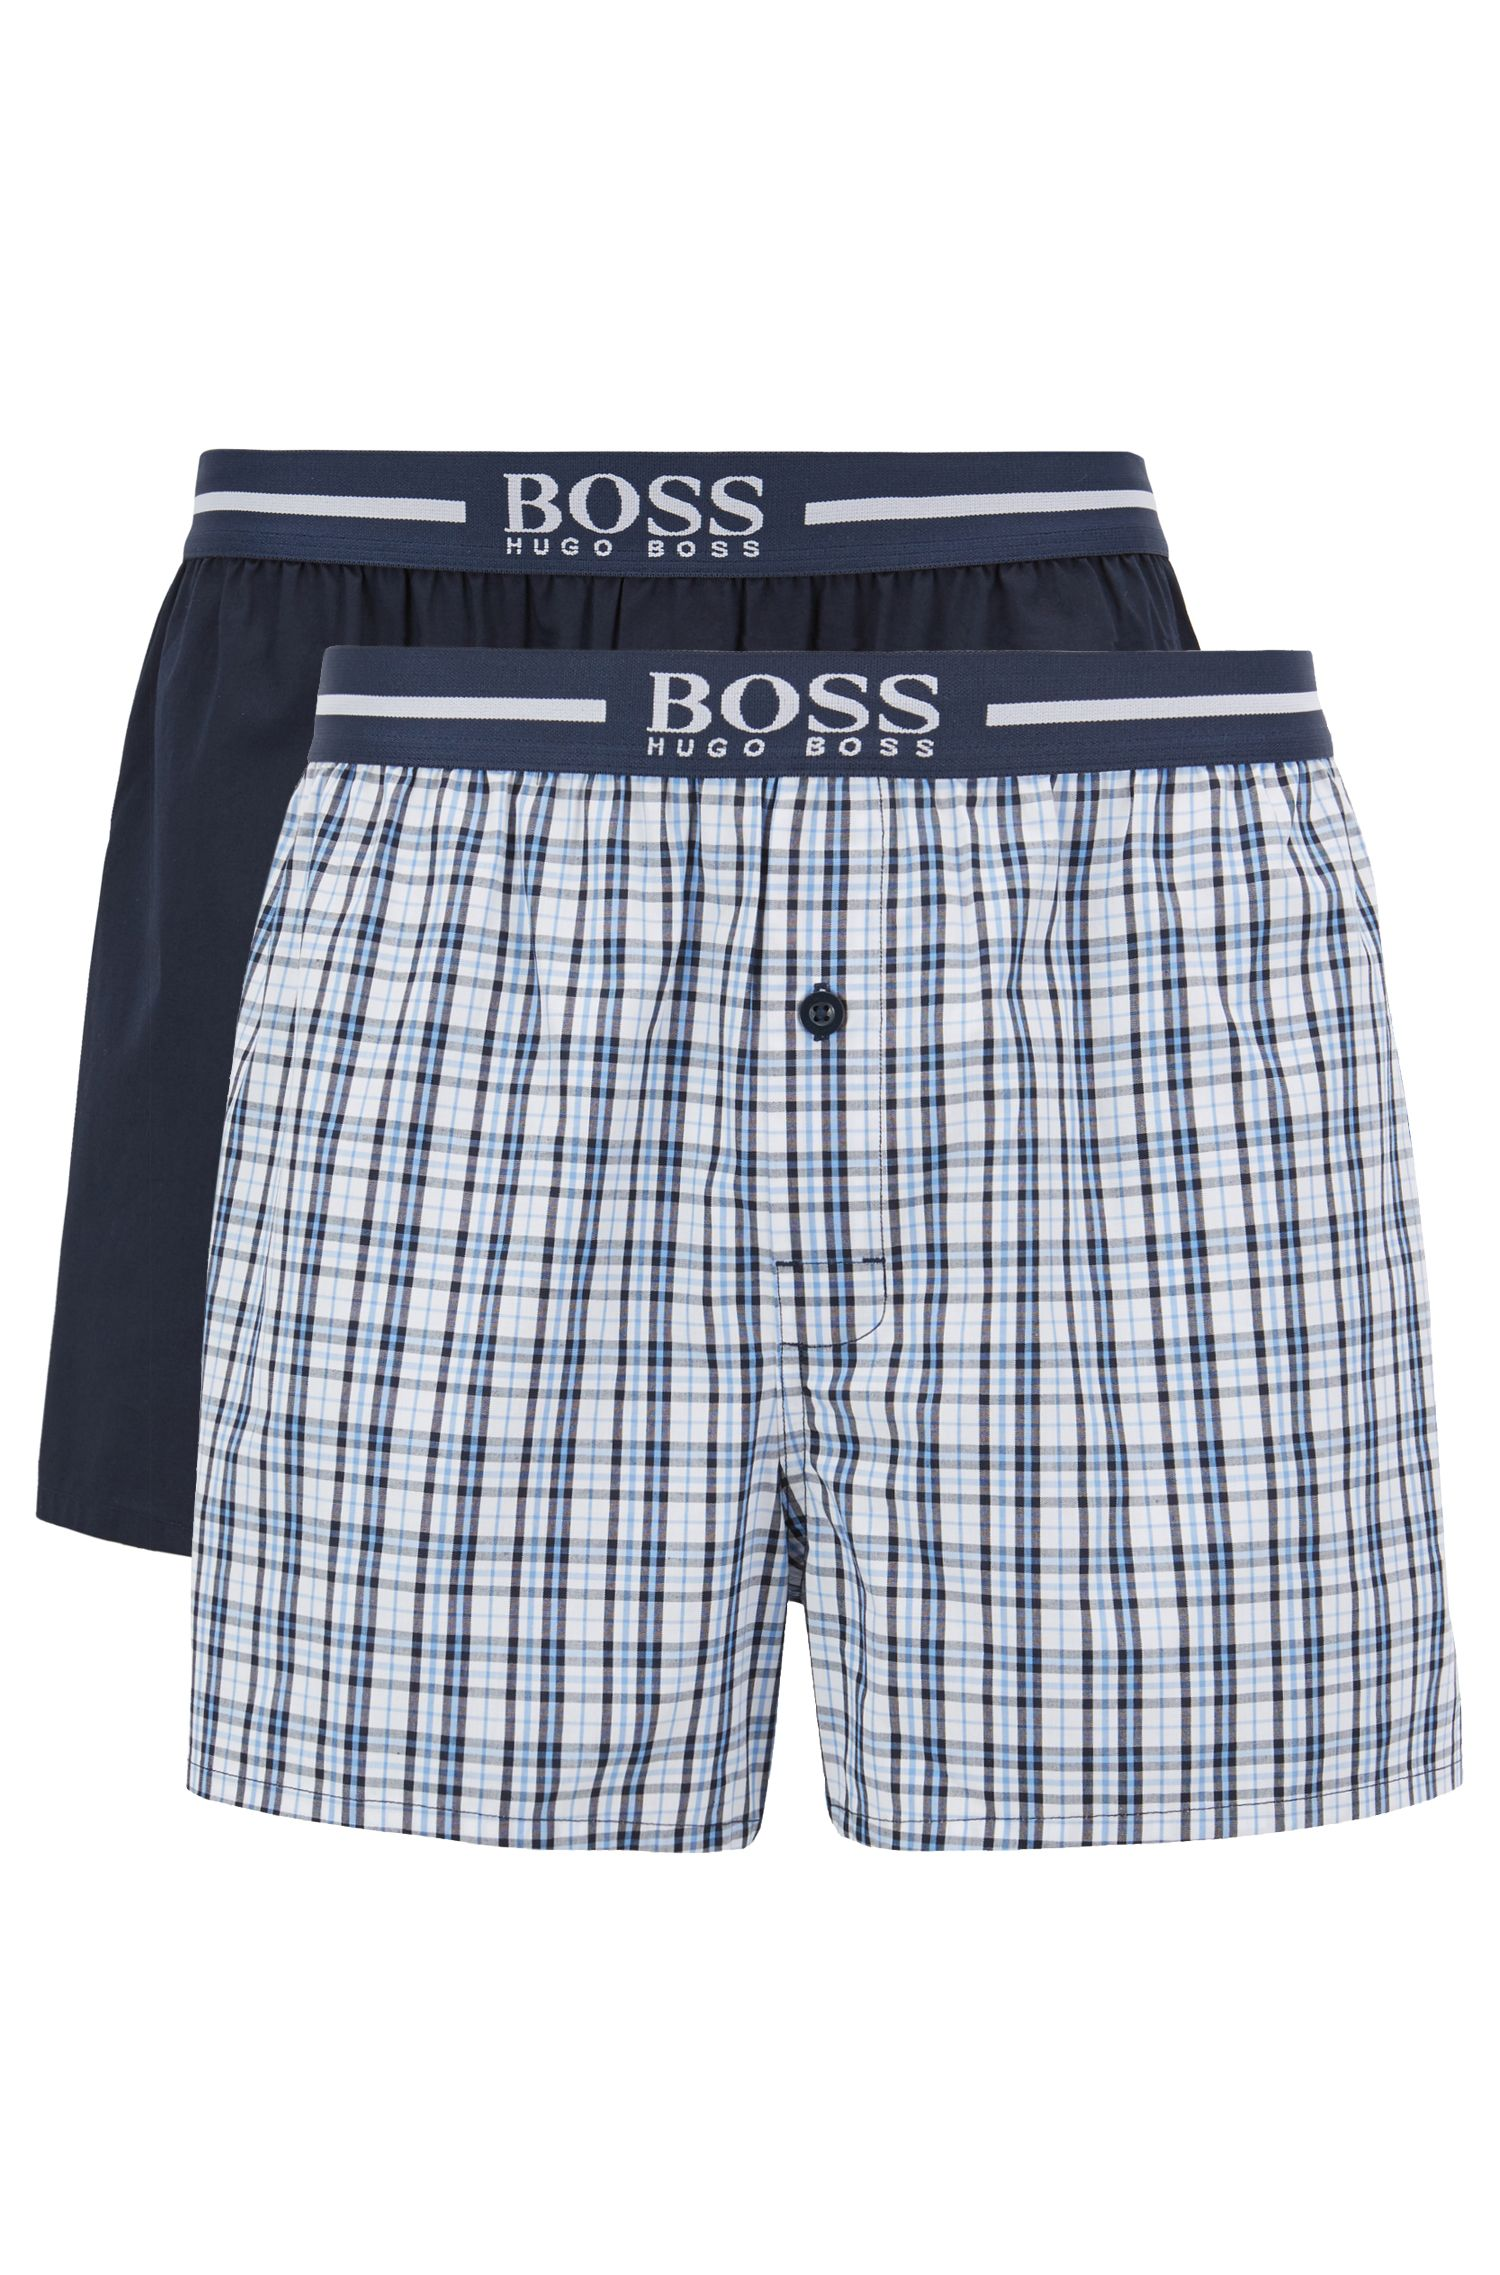 Two-pack of pyjama shorts in woven cotton poplin, Dark Blue